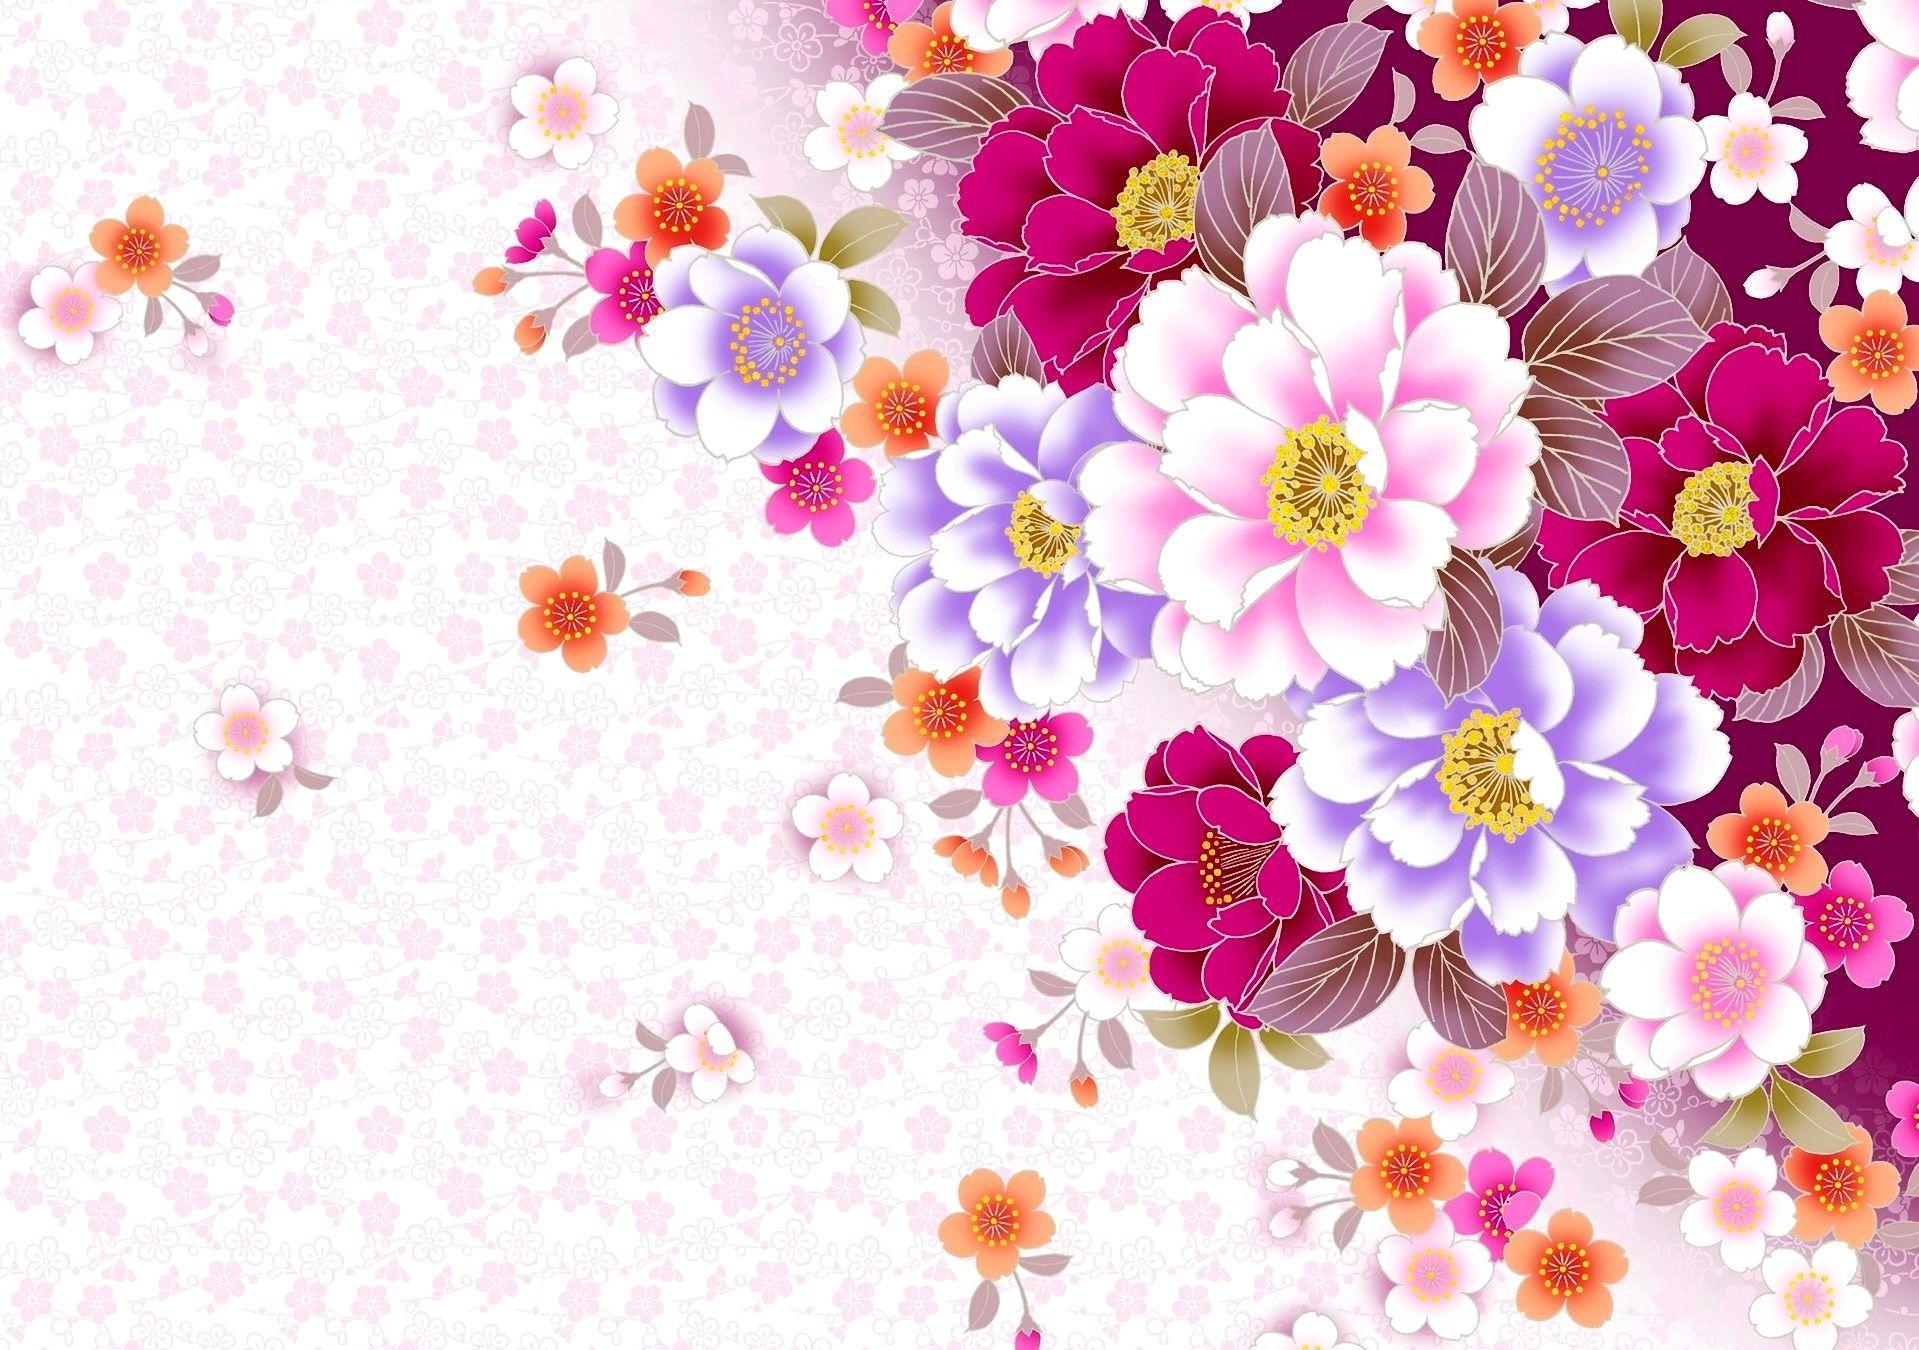 Great Pink Flower Wallpaper Laptop Phone Backgrounds Pinterest